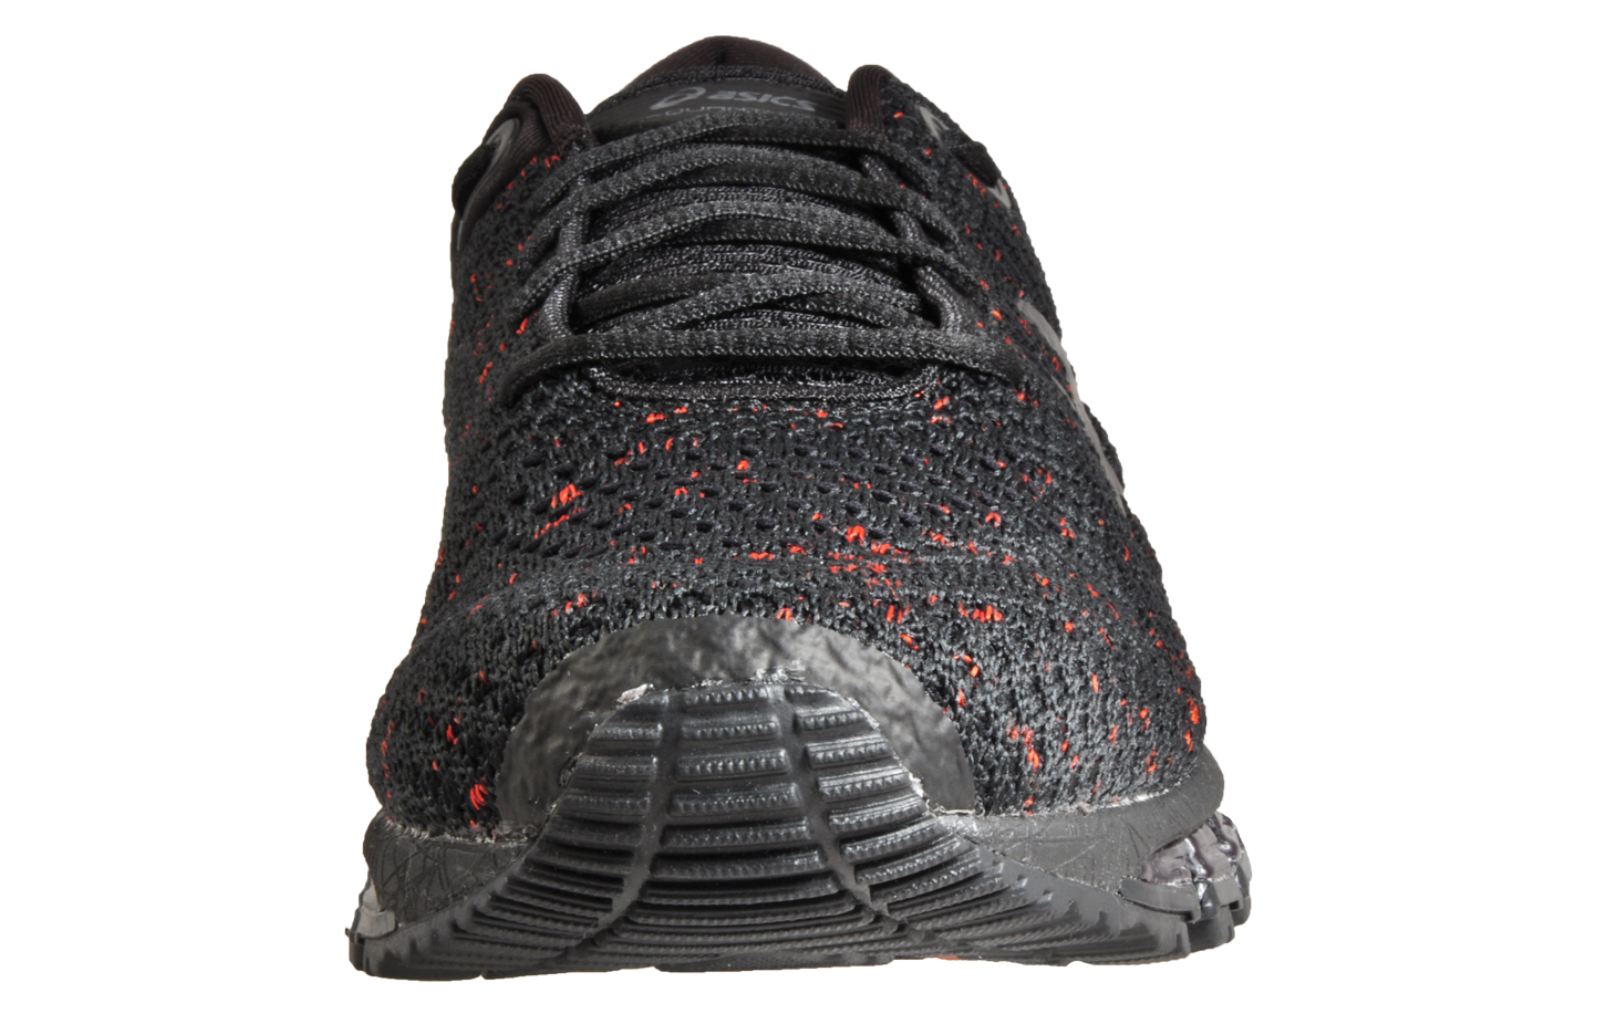 Asics Gel Quantum 360 Knit 2 Men s Premium Running Shoes Gym Trainers Black 0174733b34518